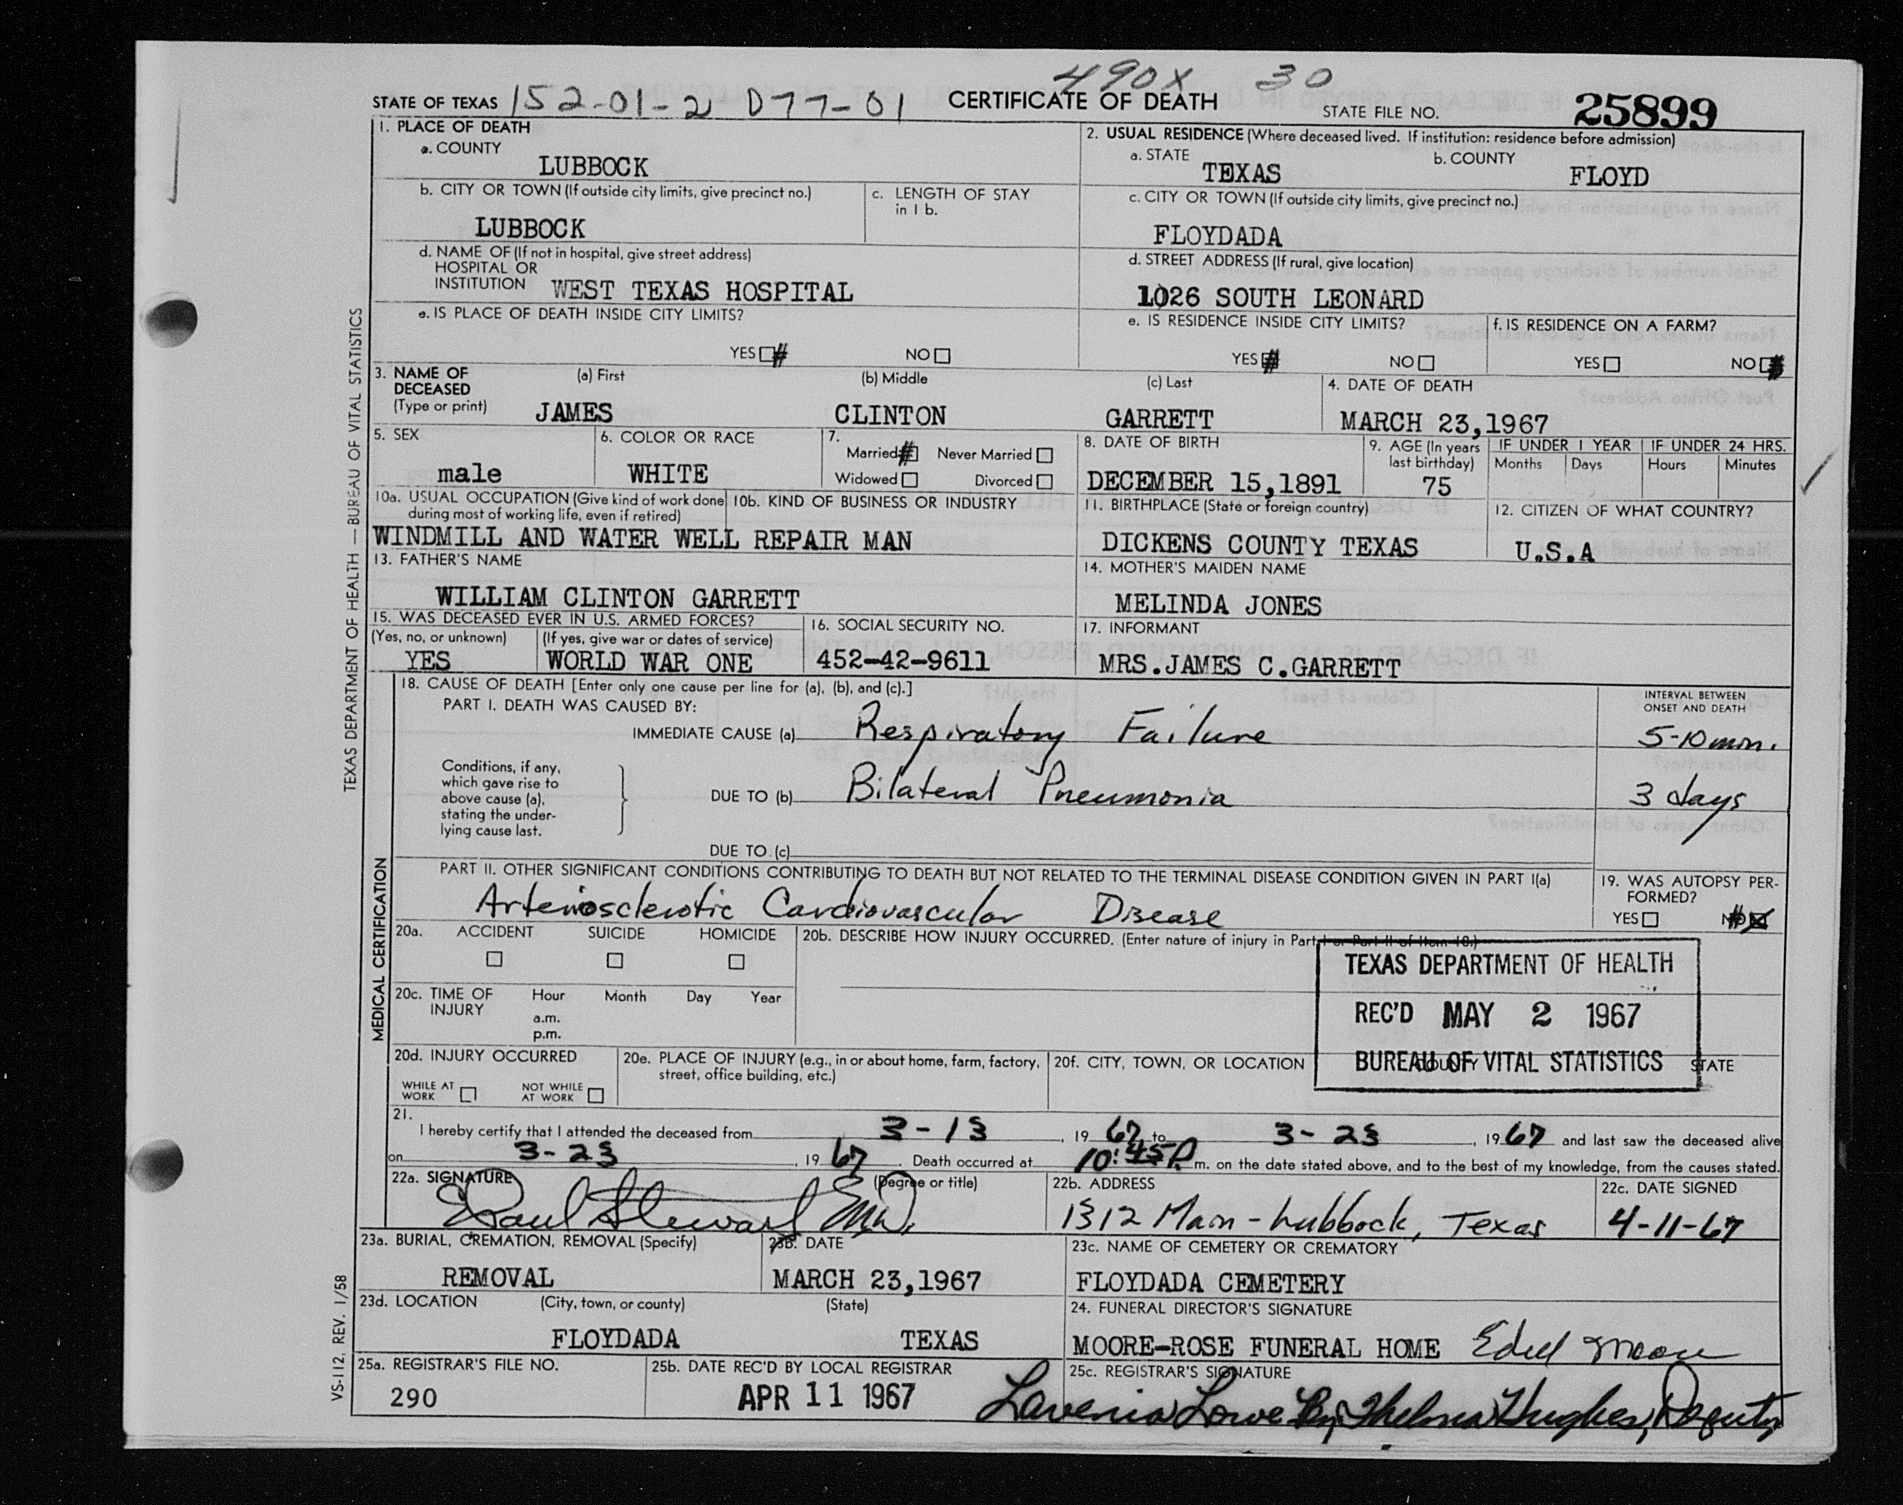 James Clinton Garrett Death Certificate Harrison